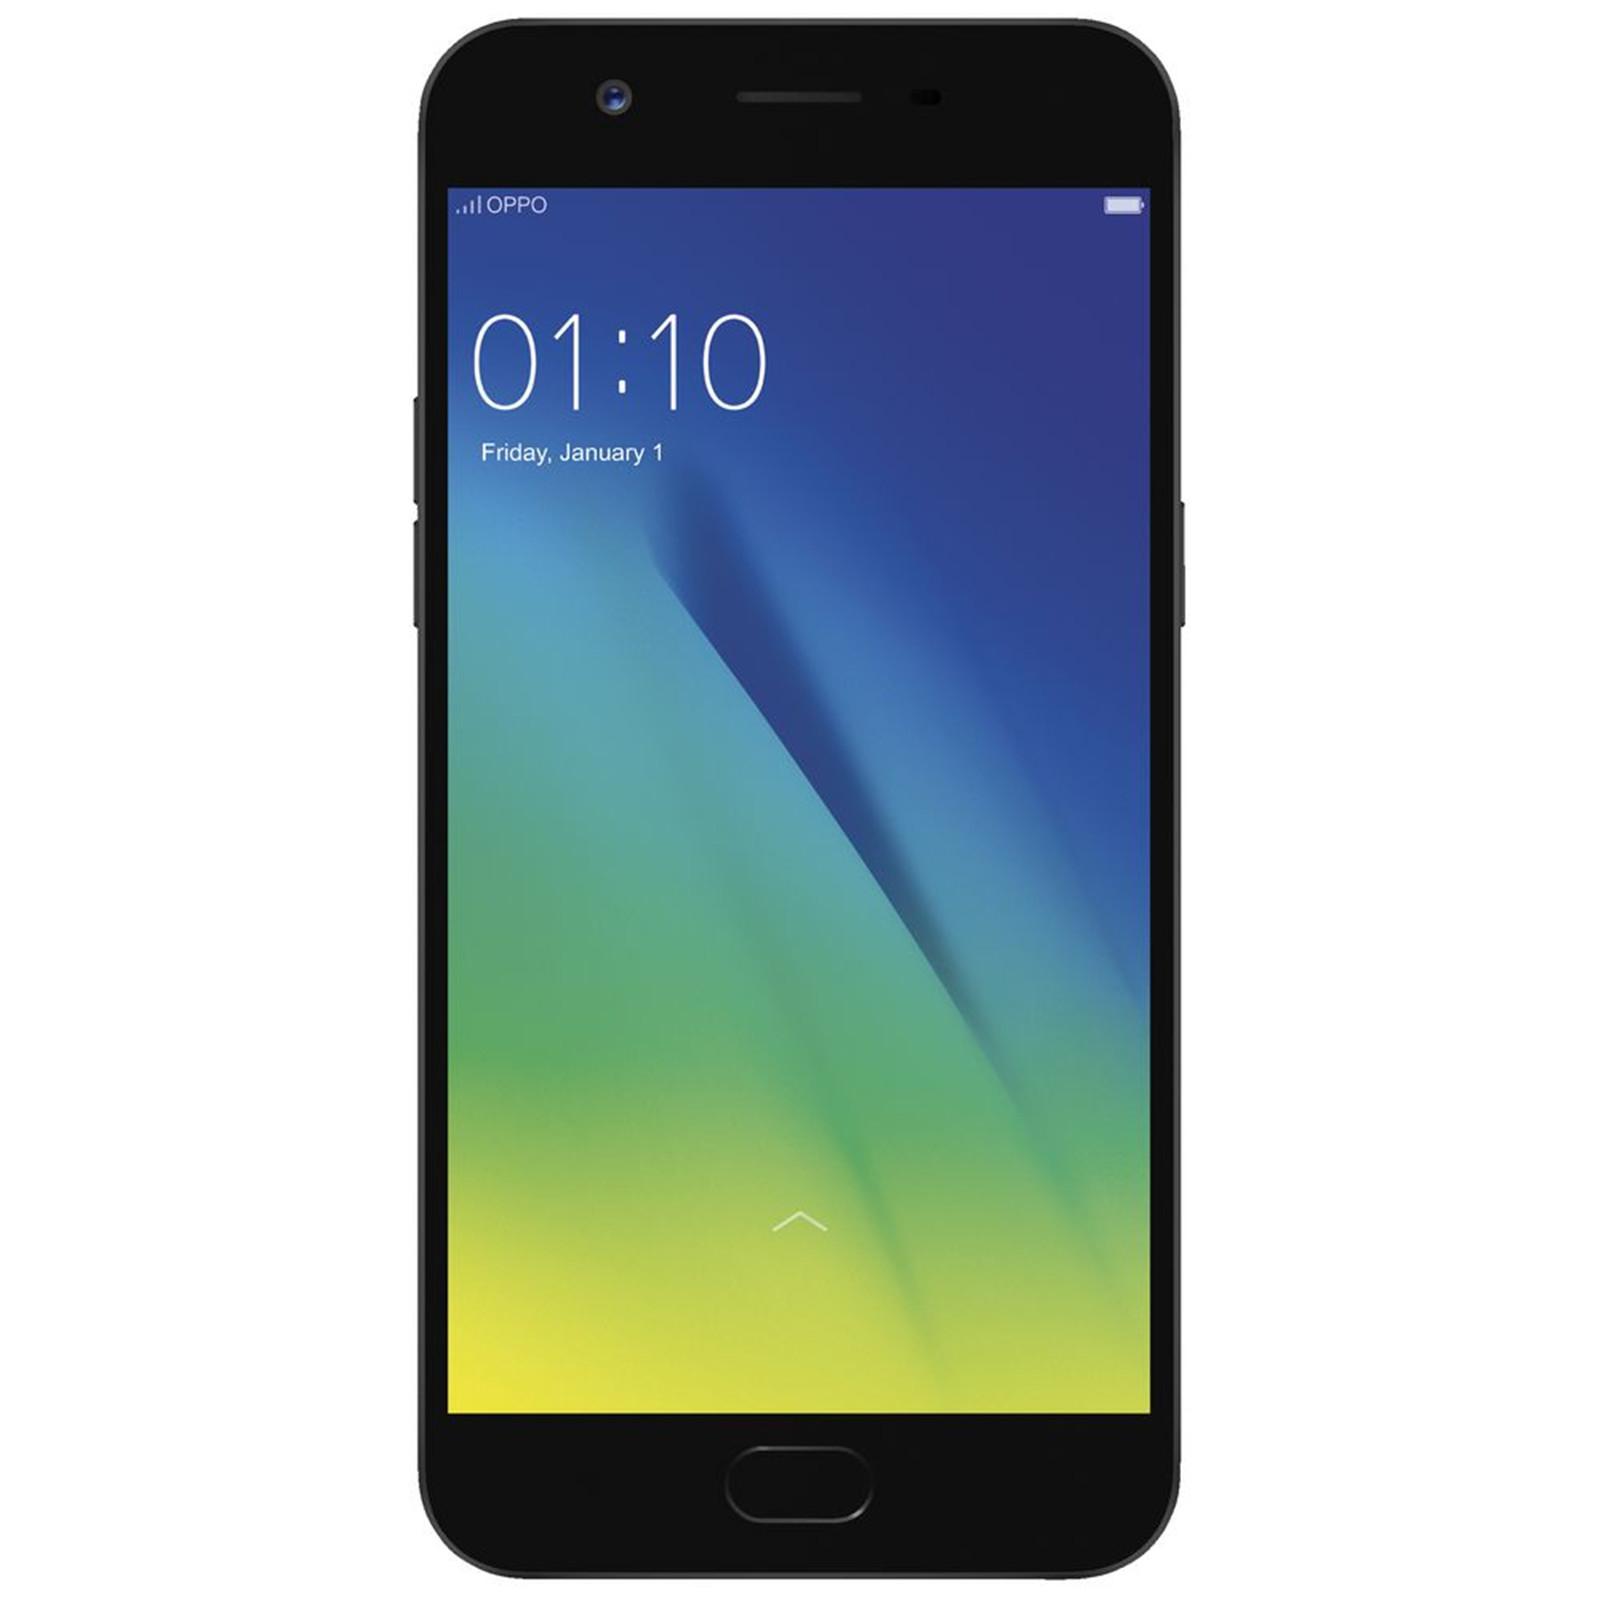 OPPO A57 Dual SIM Smartphone 32GB Black Ex Demo no accessories three months PB Warranty